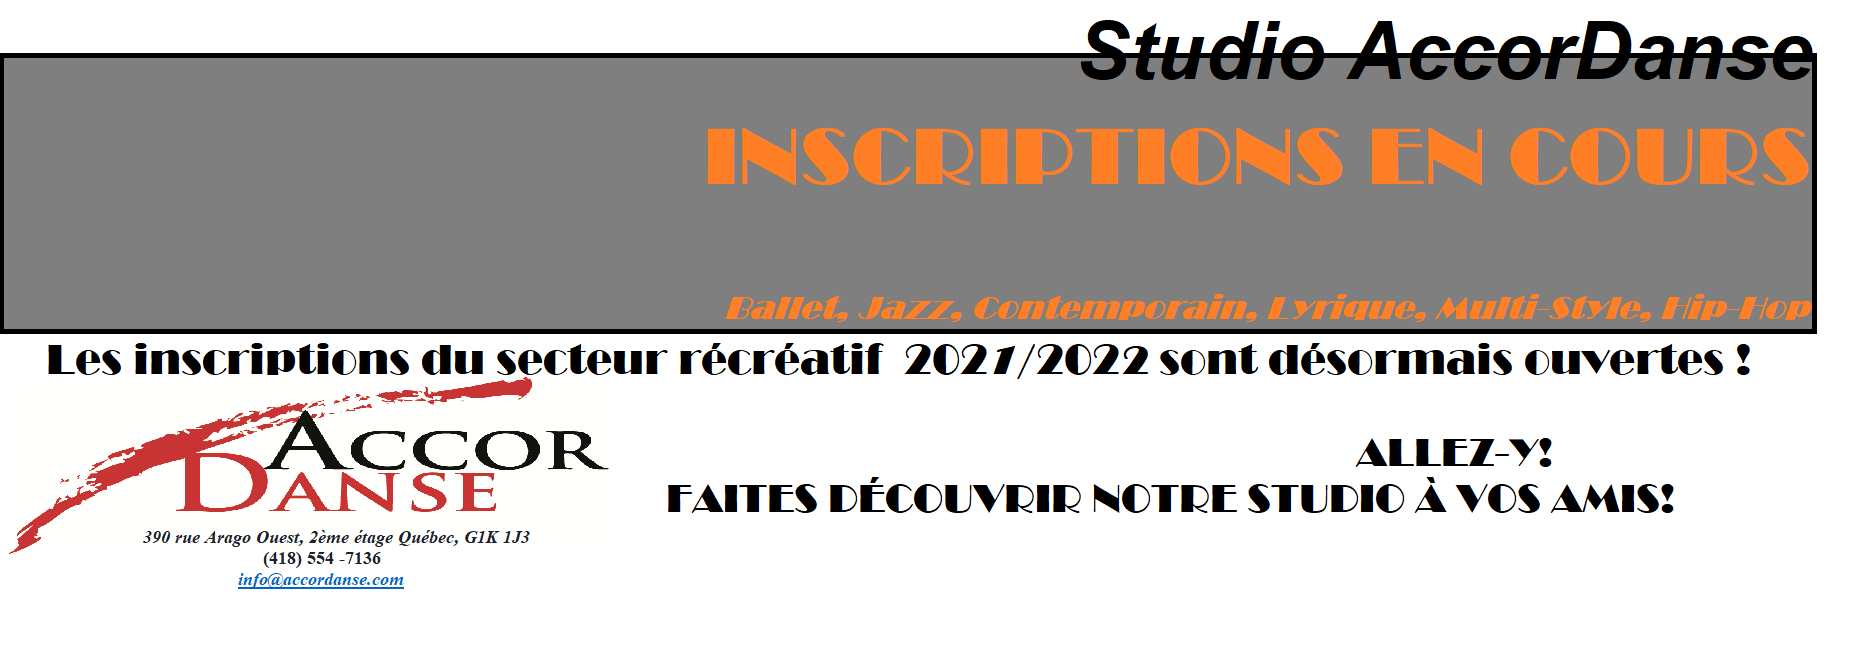 Inscription AccorDanse